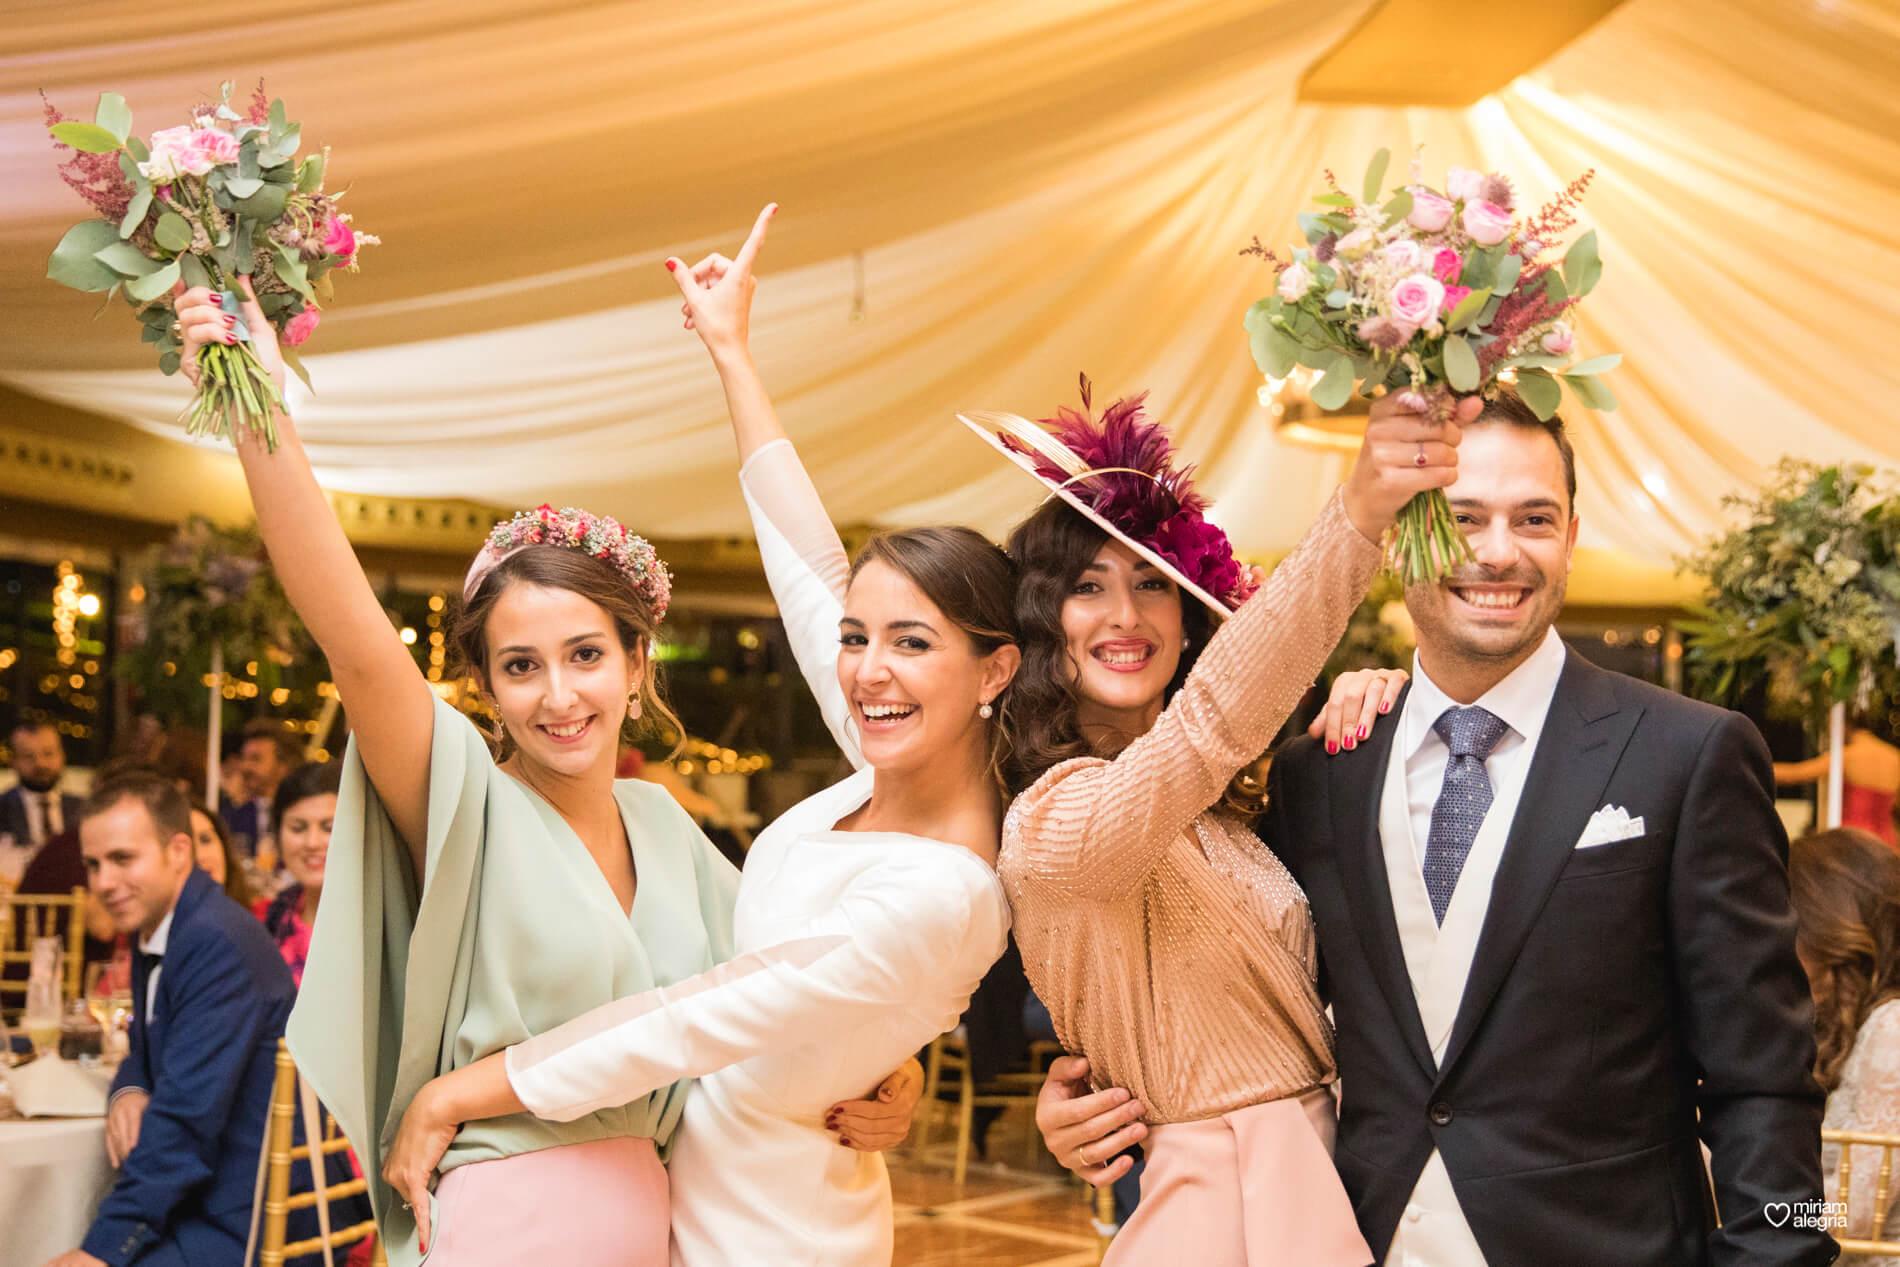 vestido-de-novia-paula-del-vas-miriam-alegria-fotografos-boda-murcia-131